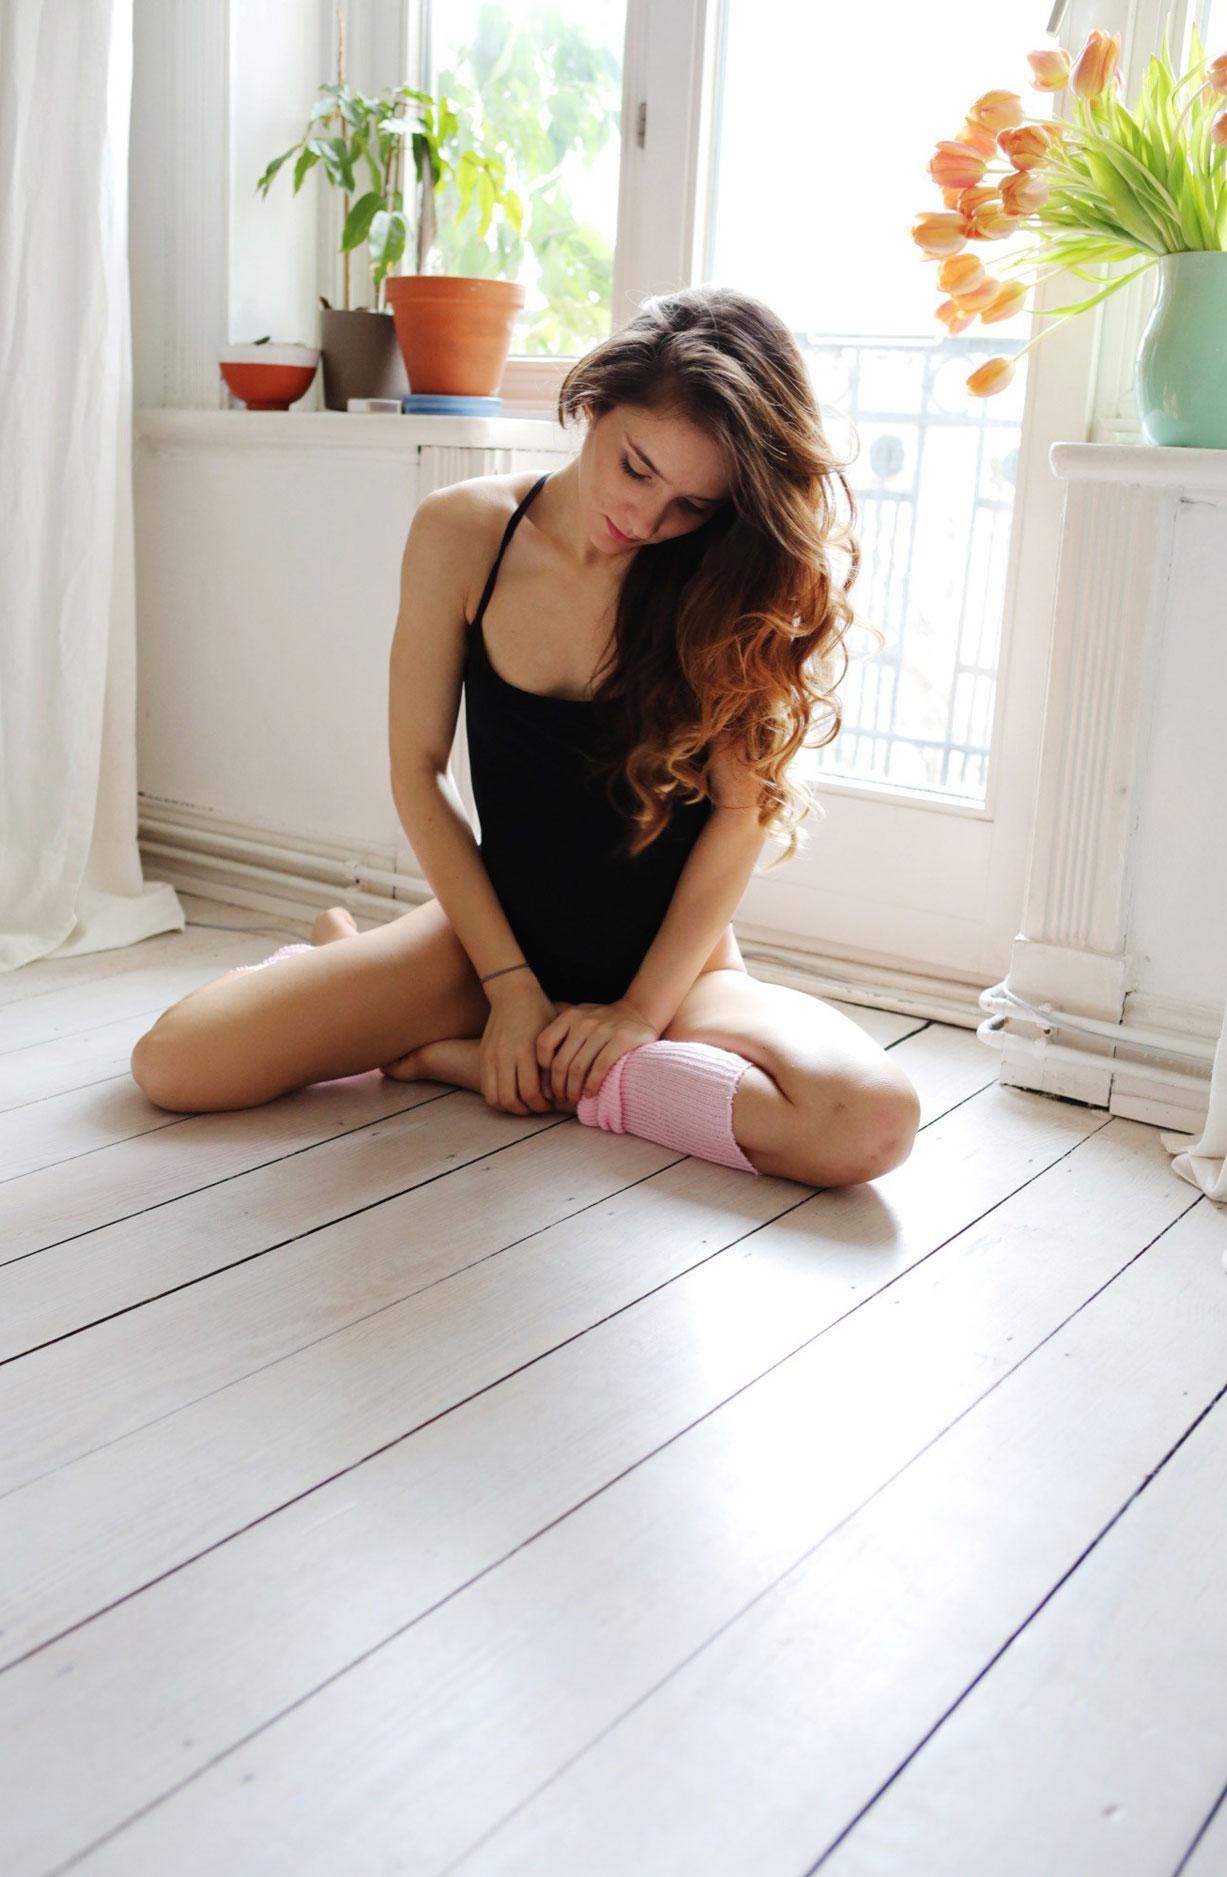 Танцовщица, модель, певица и актриса Алина Веллброк / Alina Wellbrock by Carsten Thun - AIR Magazine